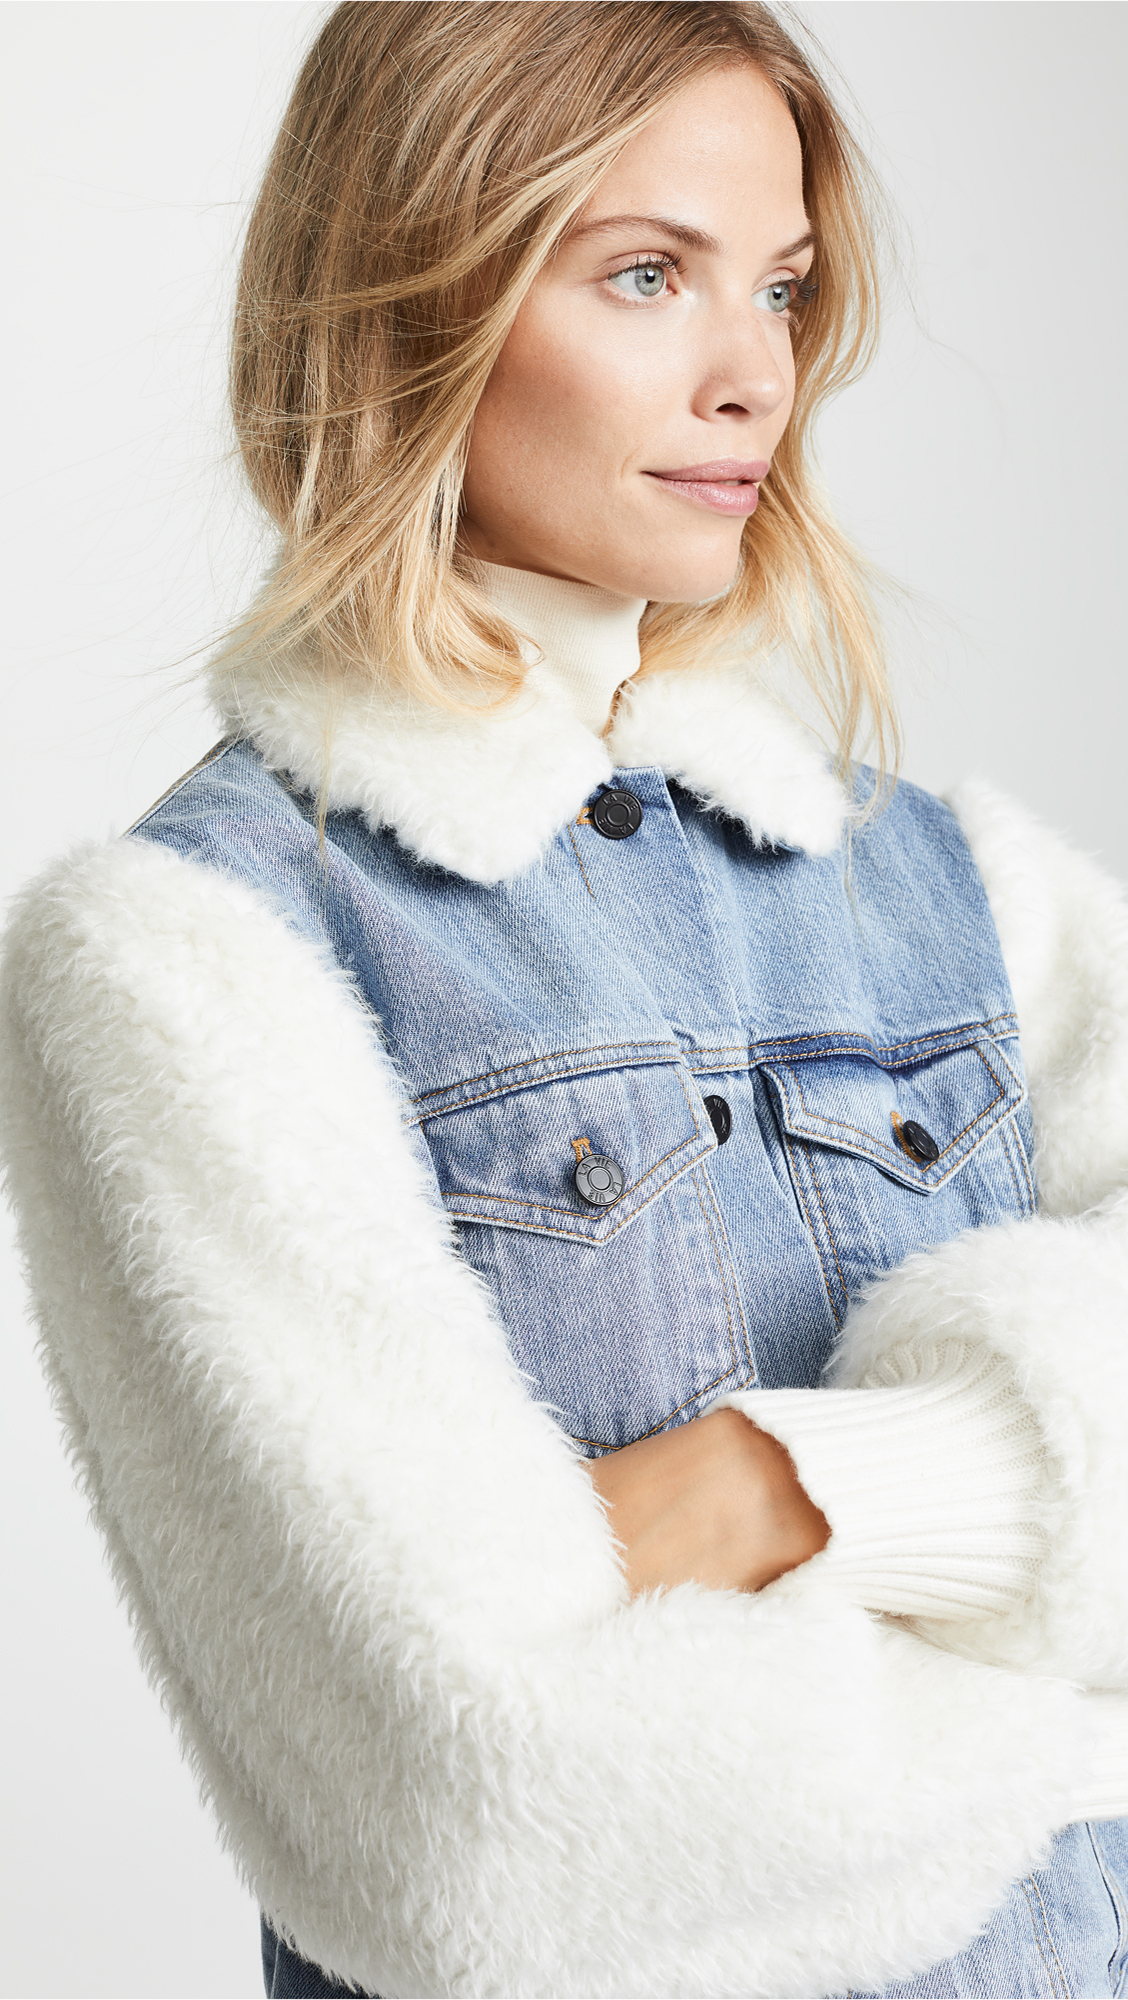 850b739c55a22 La Vie Rebecca Taylor Classic Denim   Faux Fur Jacket